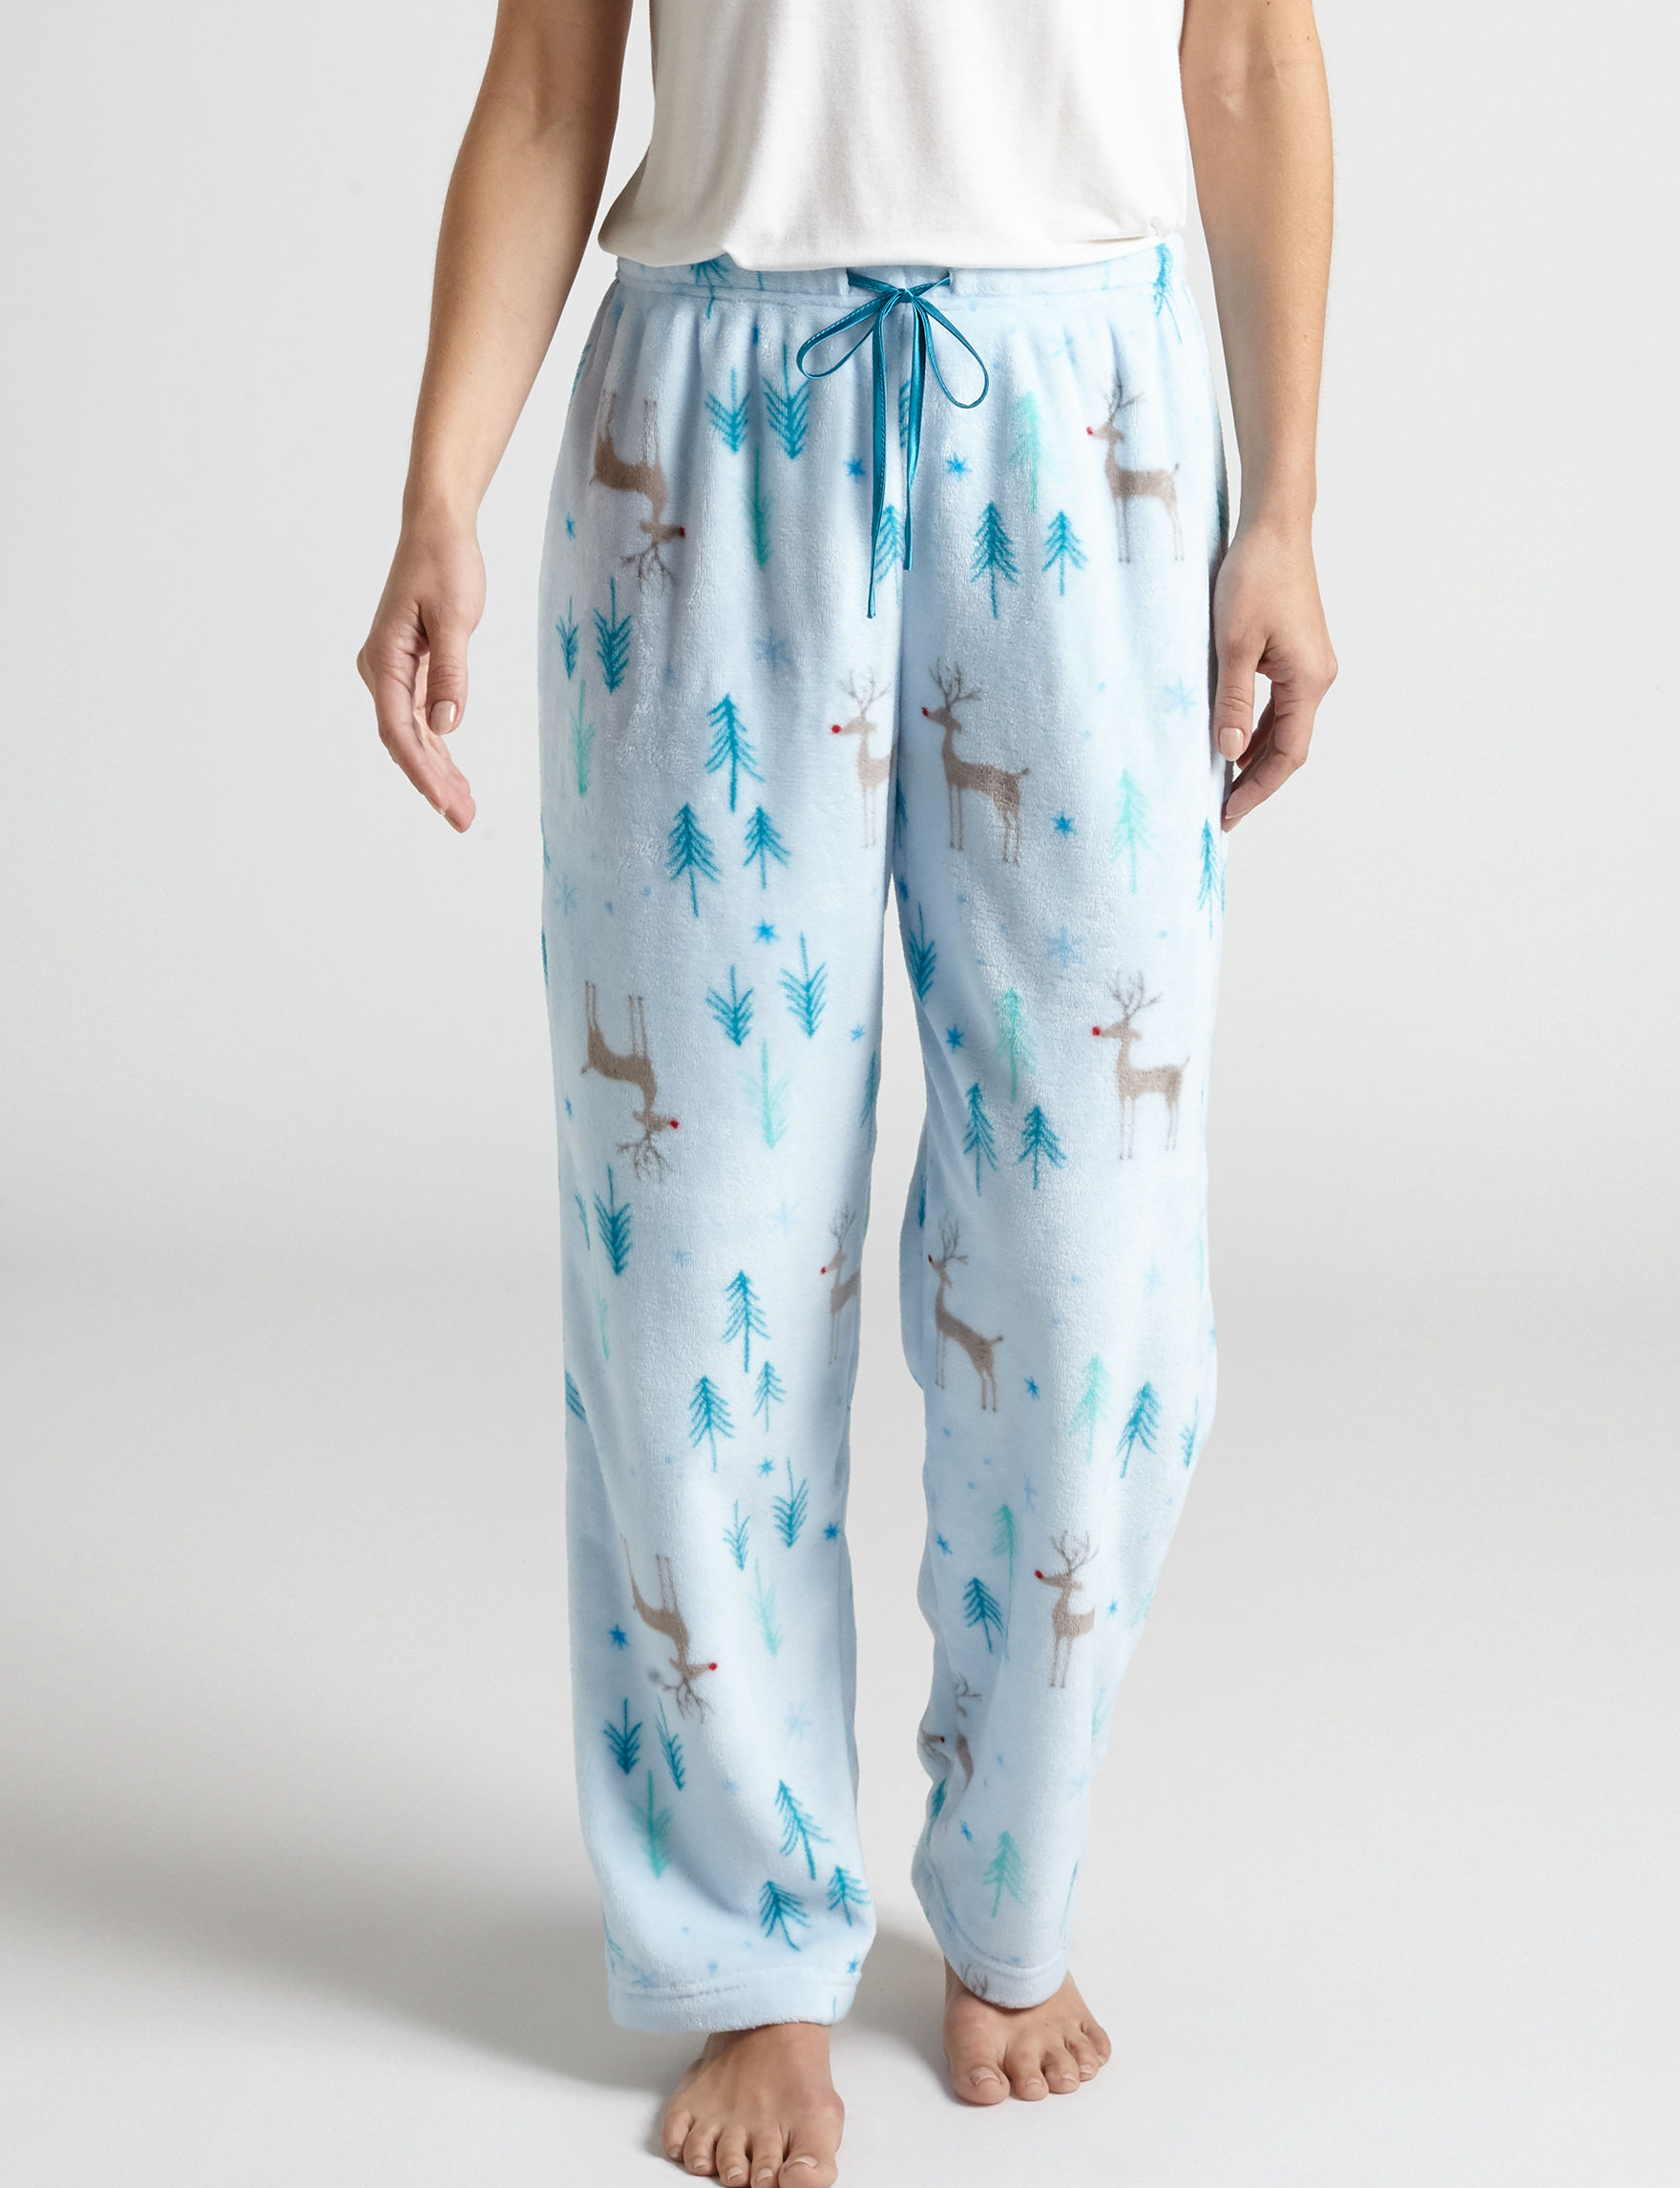 Hannah White Pajama Bottoms